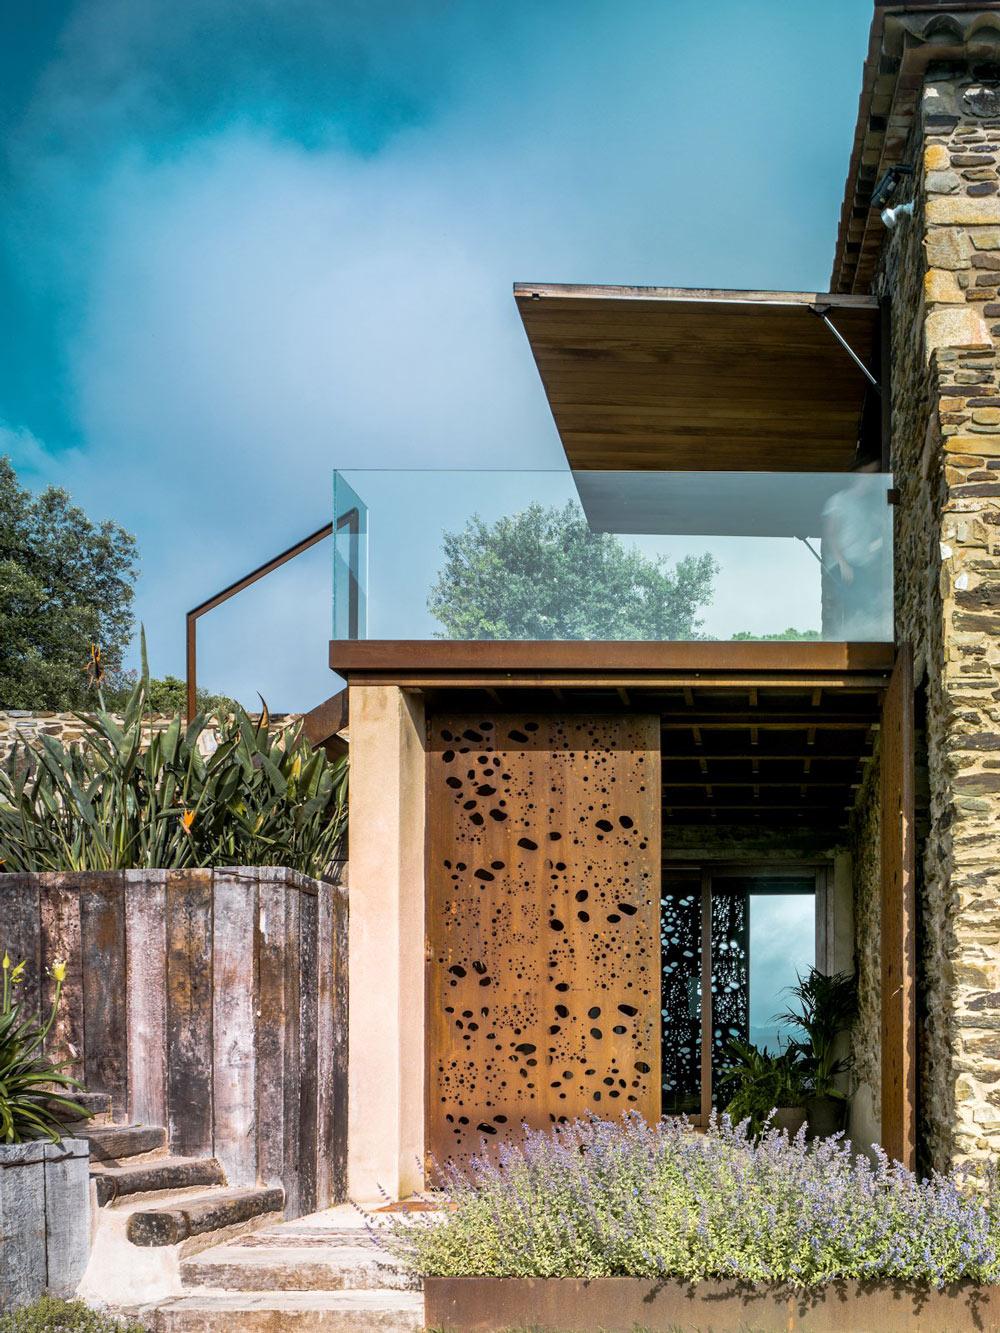 Rustic Metal Doors, Catalan Farmhouse, Girona, Spain